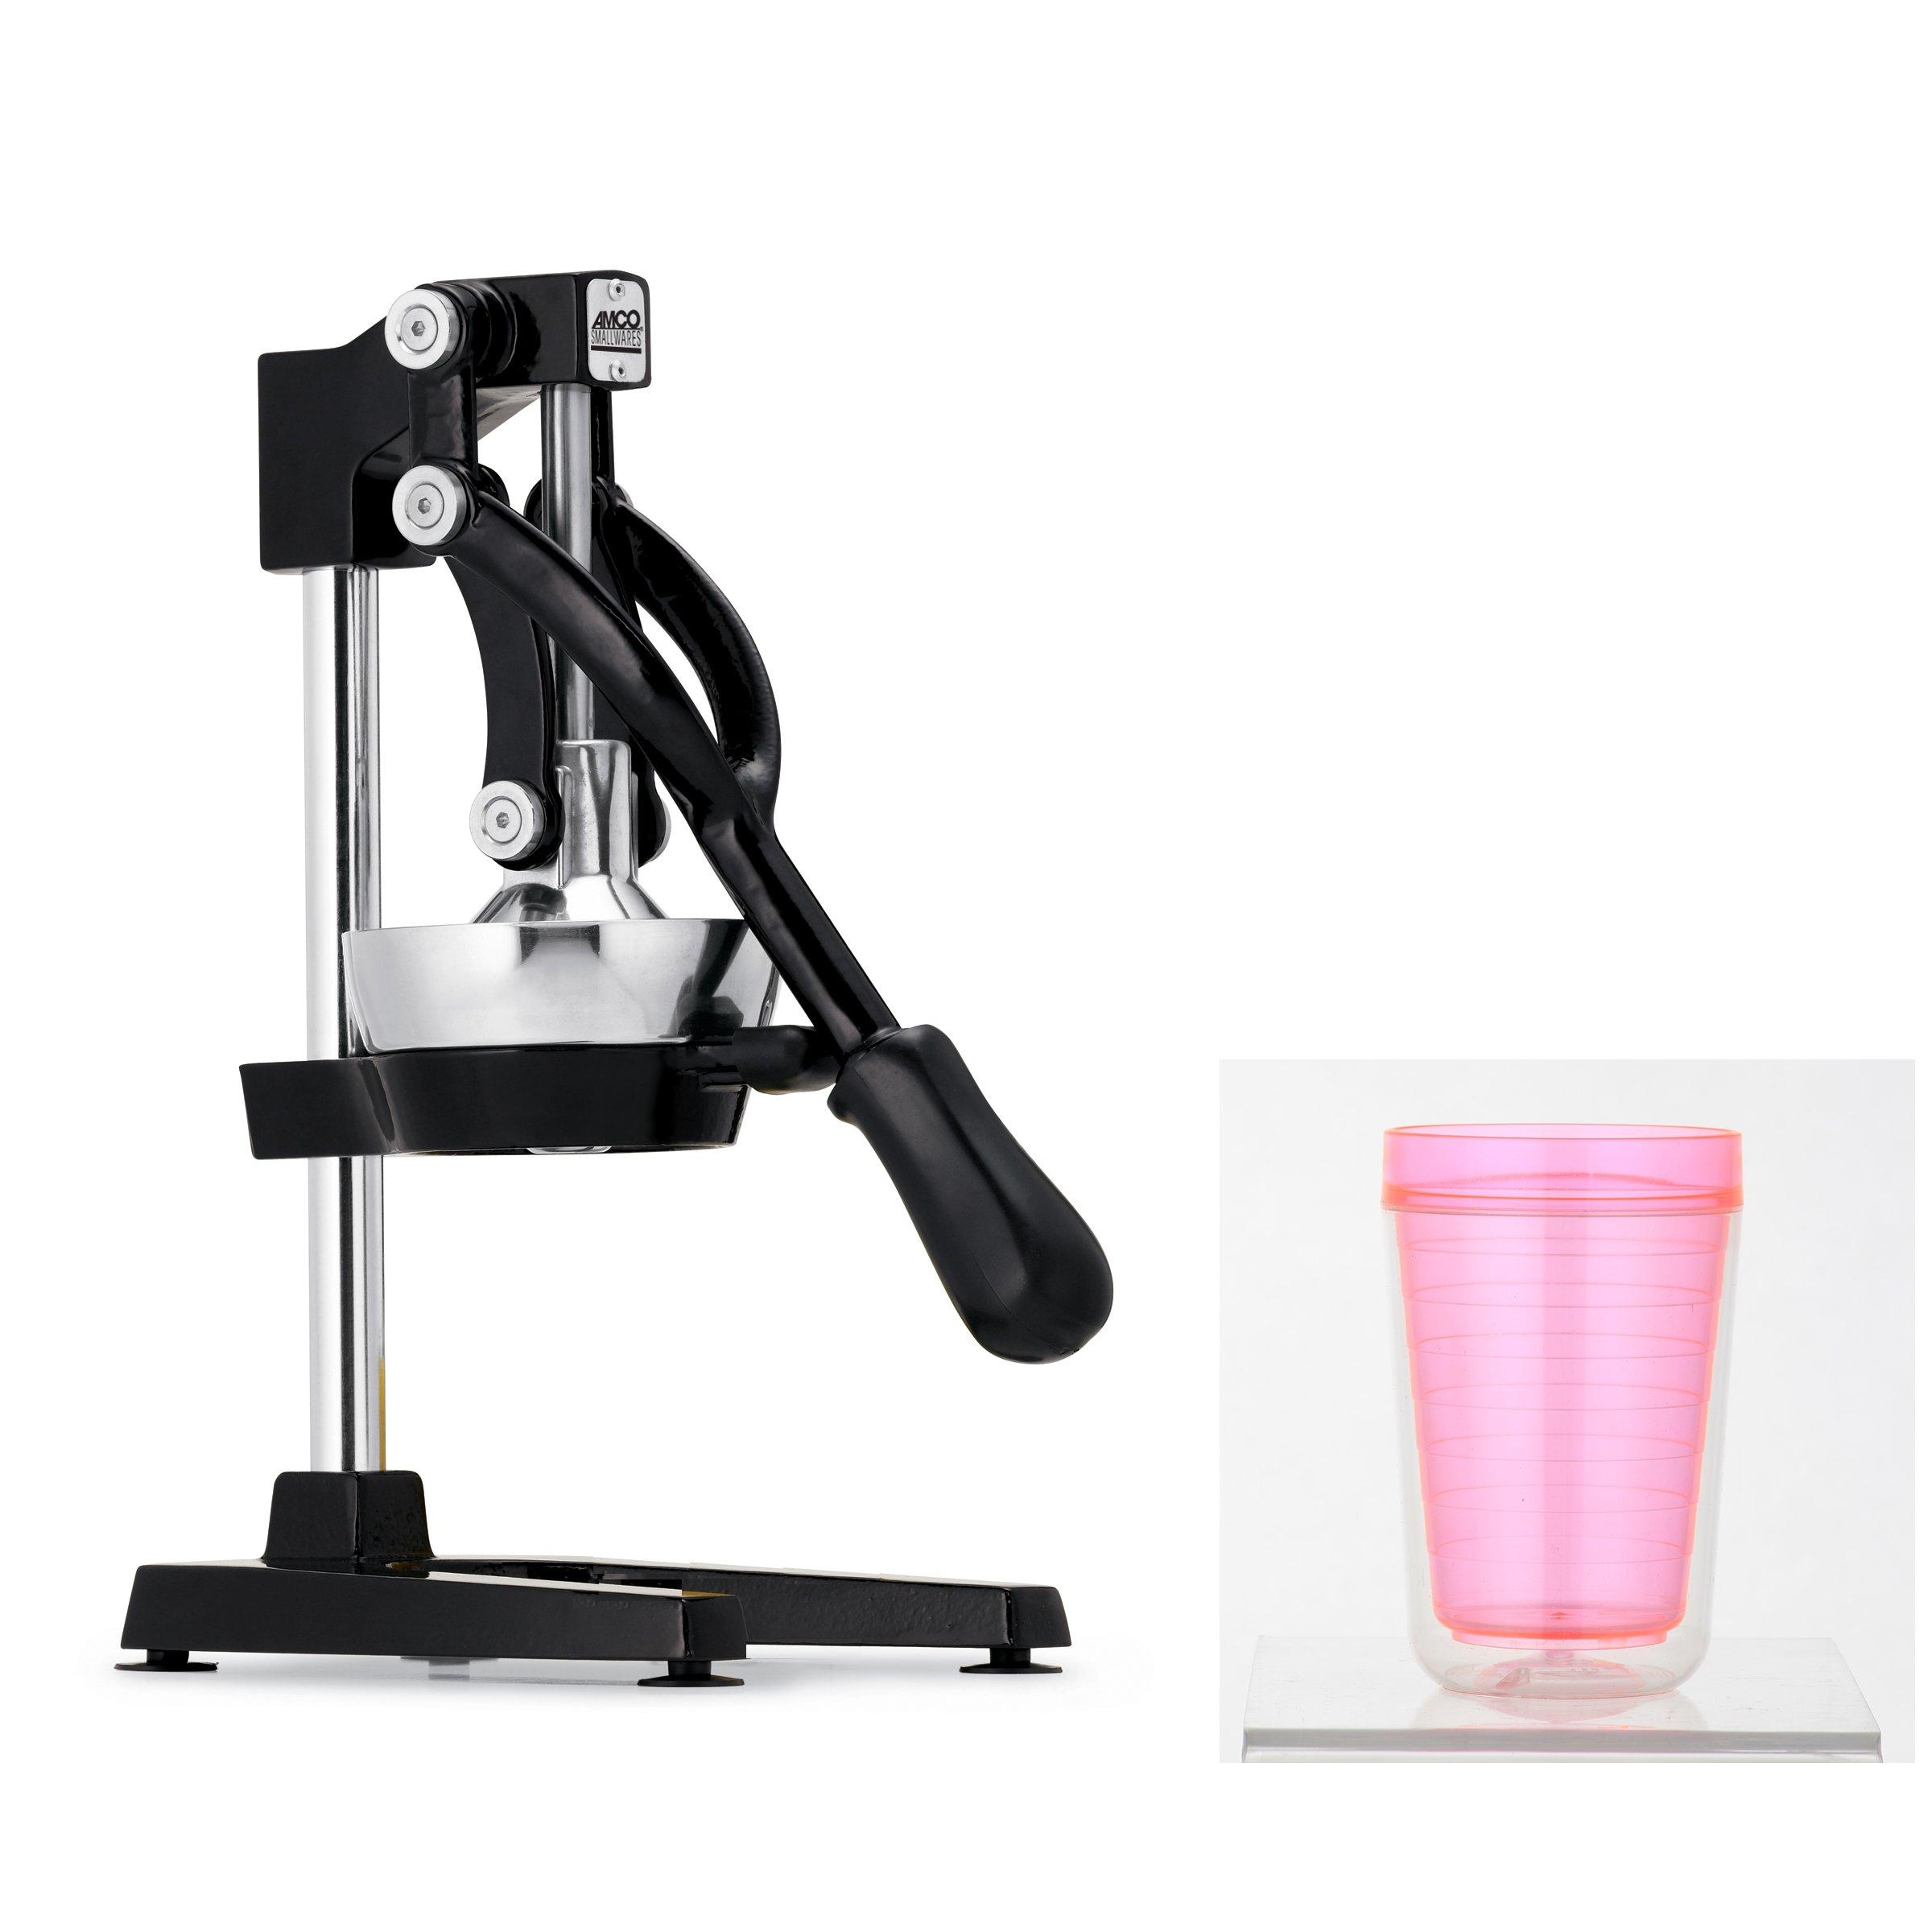 Focus Foodservice Jupiter Large Commercial Juice Press (Black w/BPA Free Juice Cup)